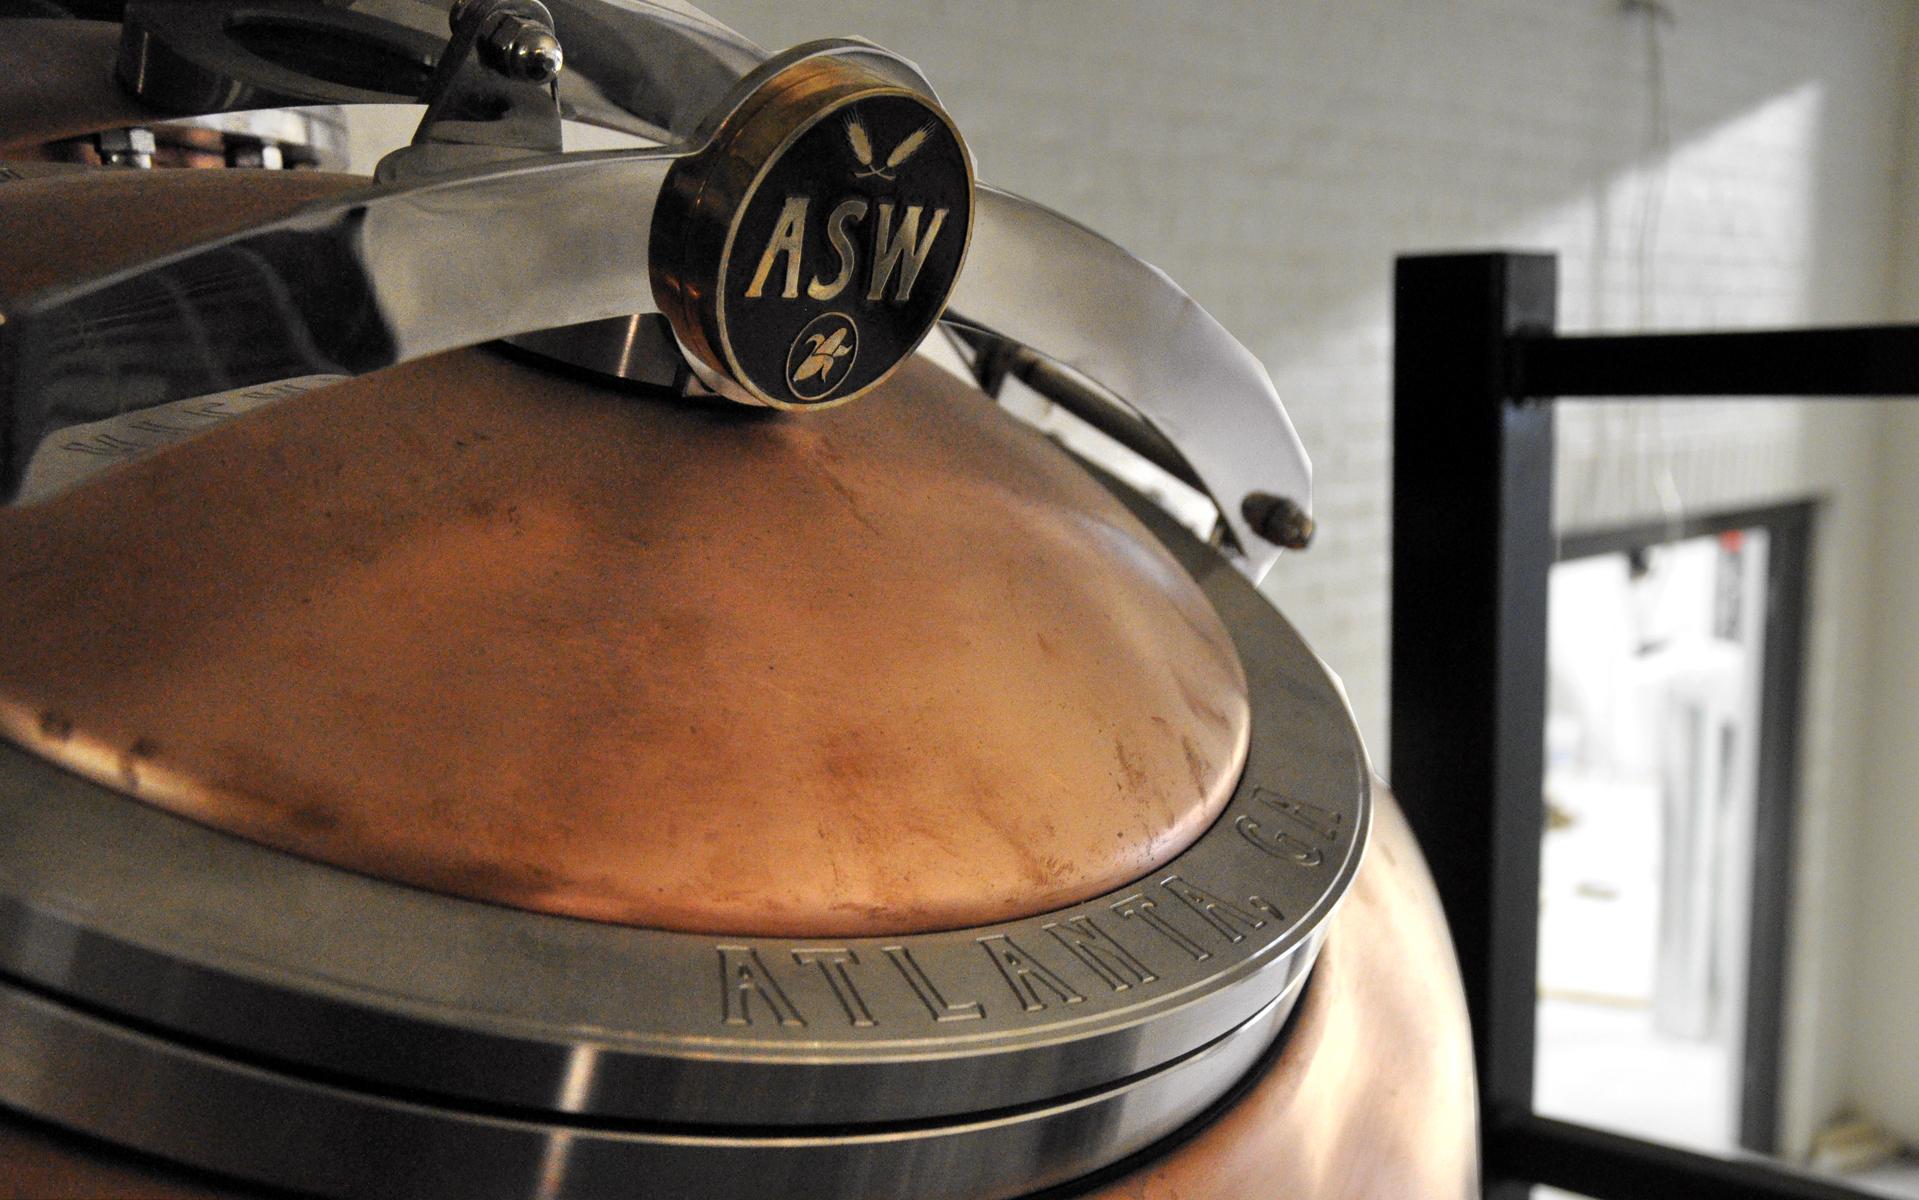 ASW Distillery - Atlanta craft whiskey _ brandy distillery - ASW Atlanta, GA up close on stills Nov 2015.jpg